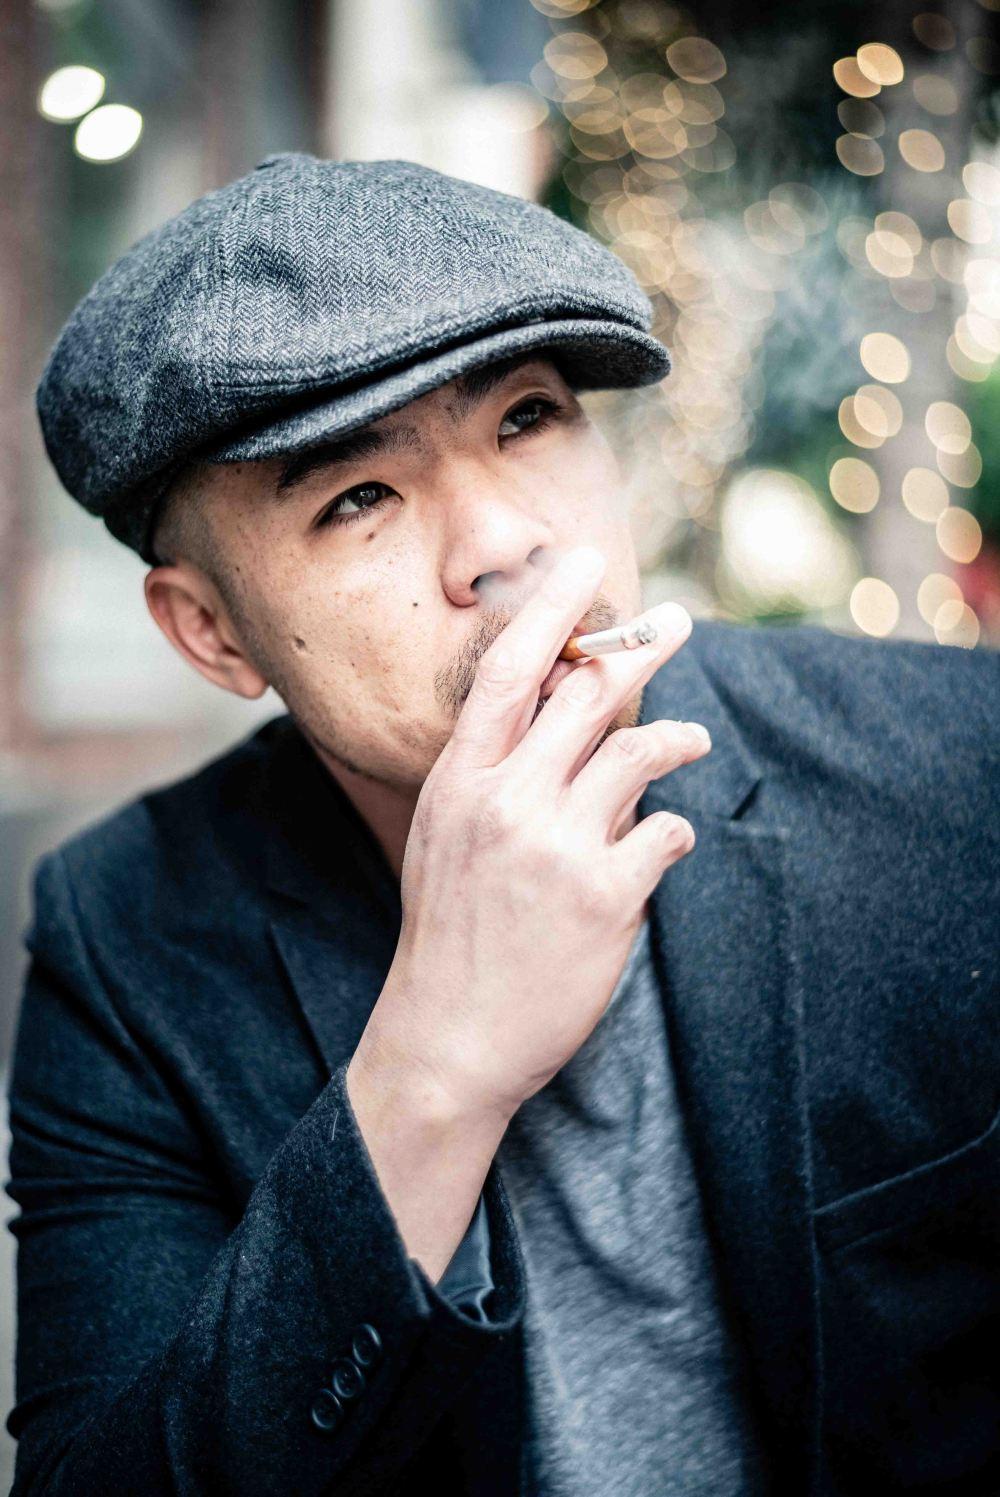 neilson street portrait photography photographer bay area san francisco maiden lane dapper hat smoker